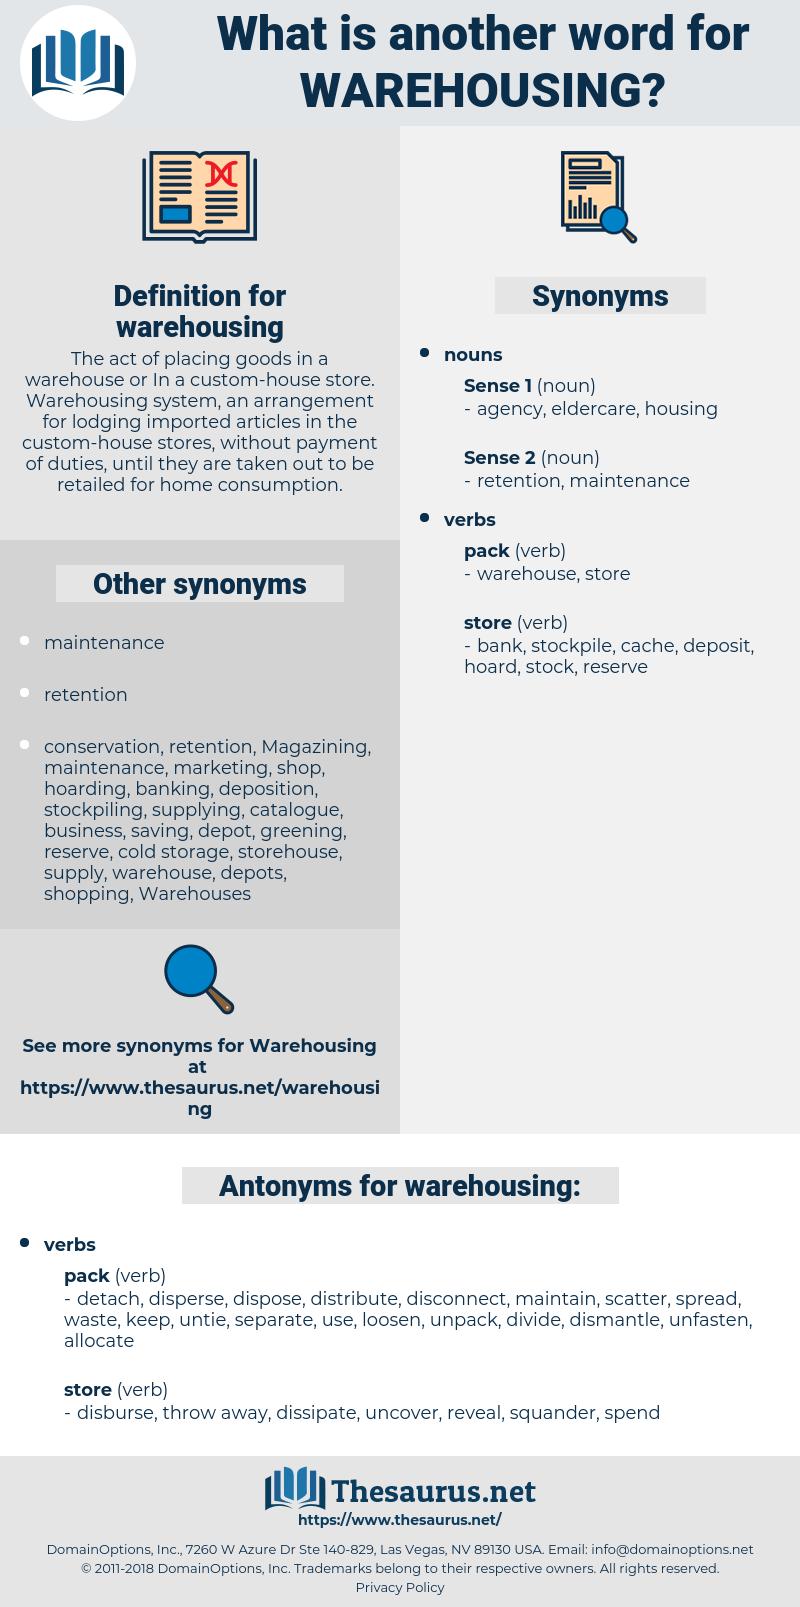 warehousing, synonym warehousing, another word for warehousing, words like warehousing, thesaurus warehousing